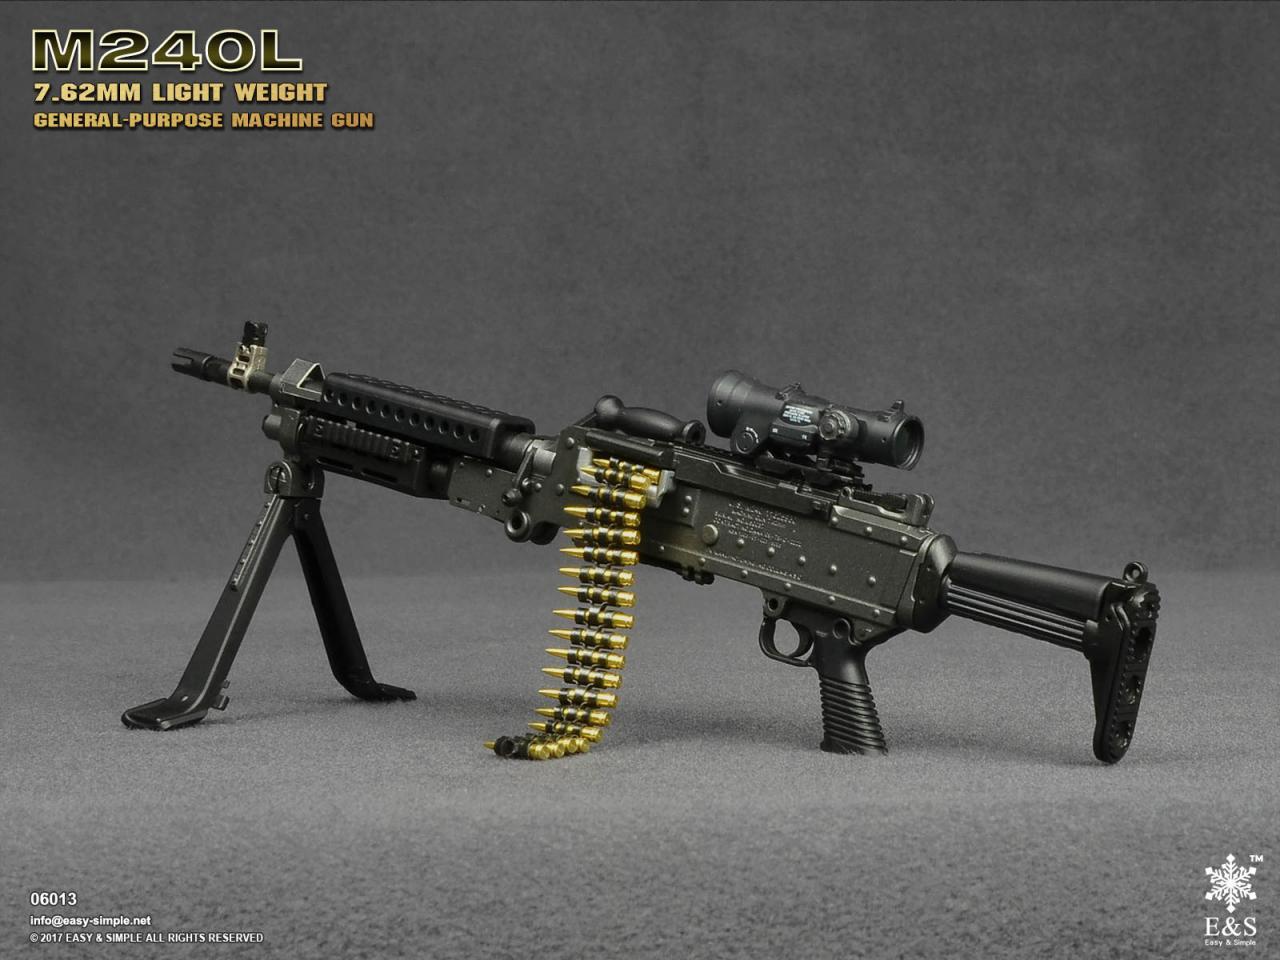 Easy&Simple 06013 M240L 7.62mm Light Weight General Purpose Machine Gun-06013-3-jpg